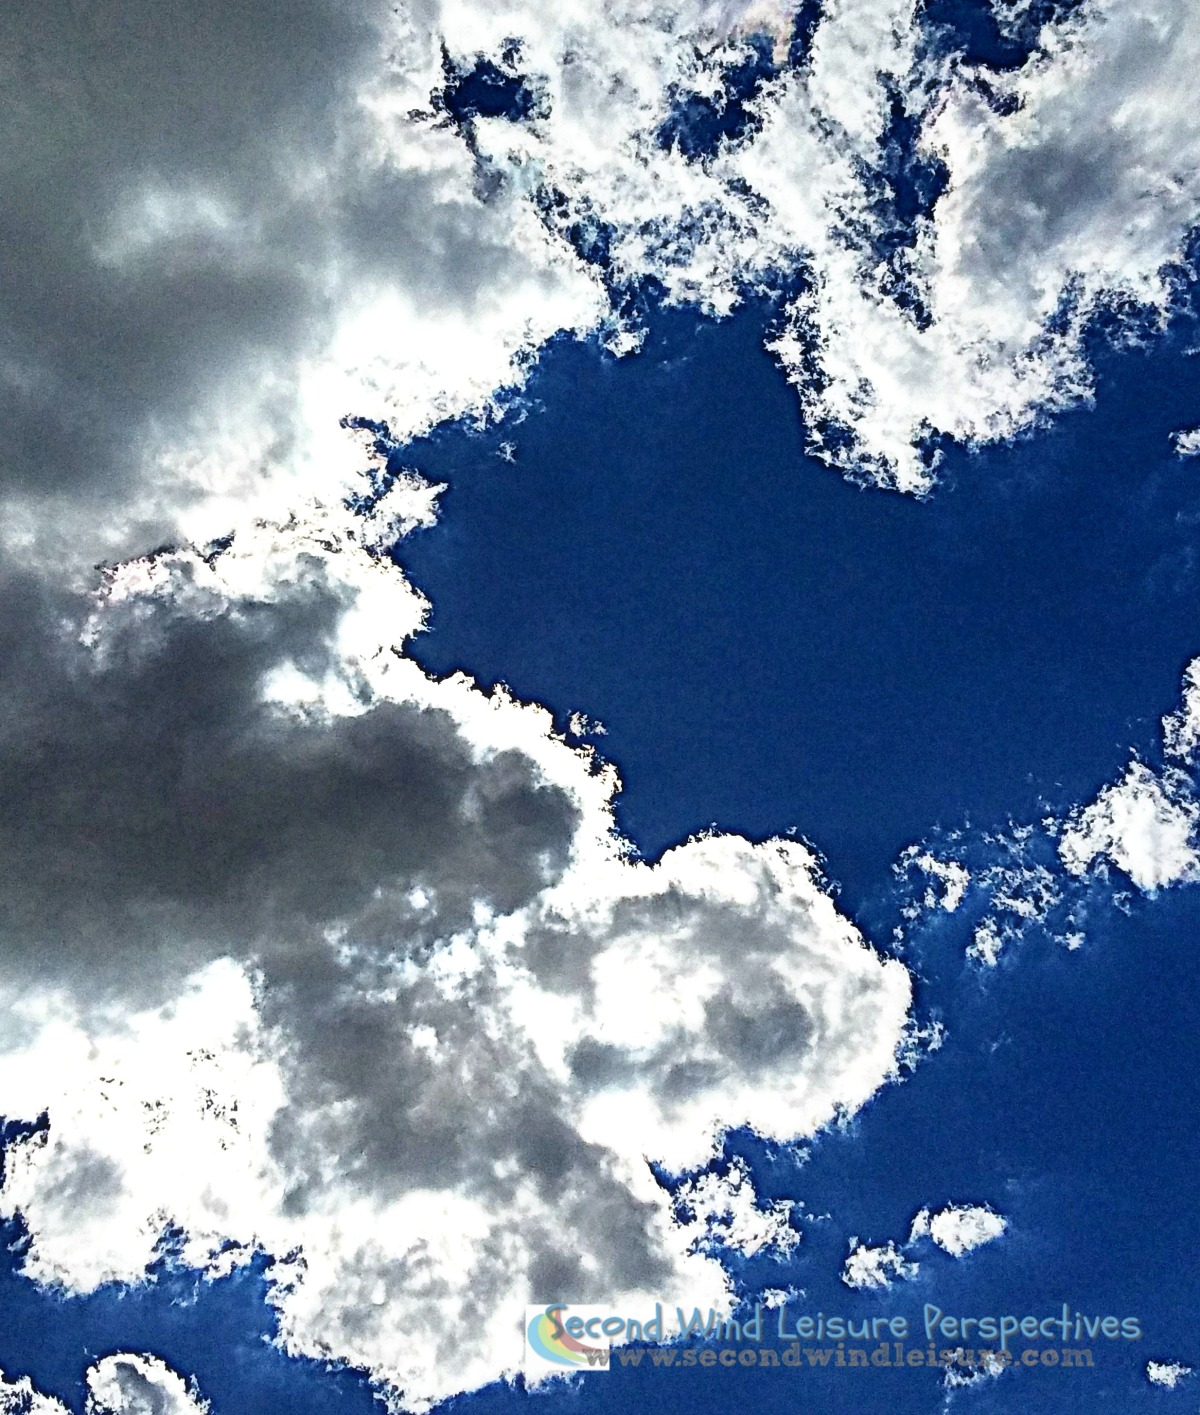 Cloud puff temporarily hides the sun